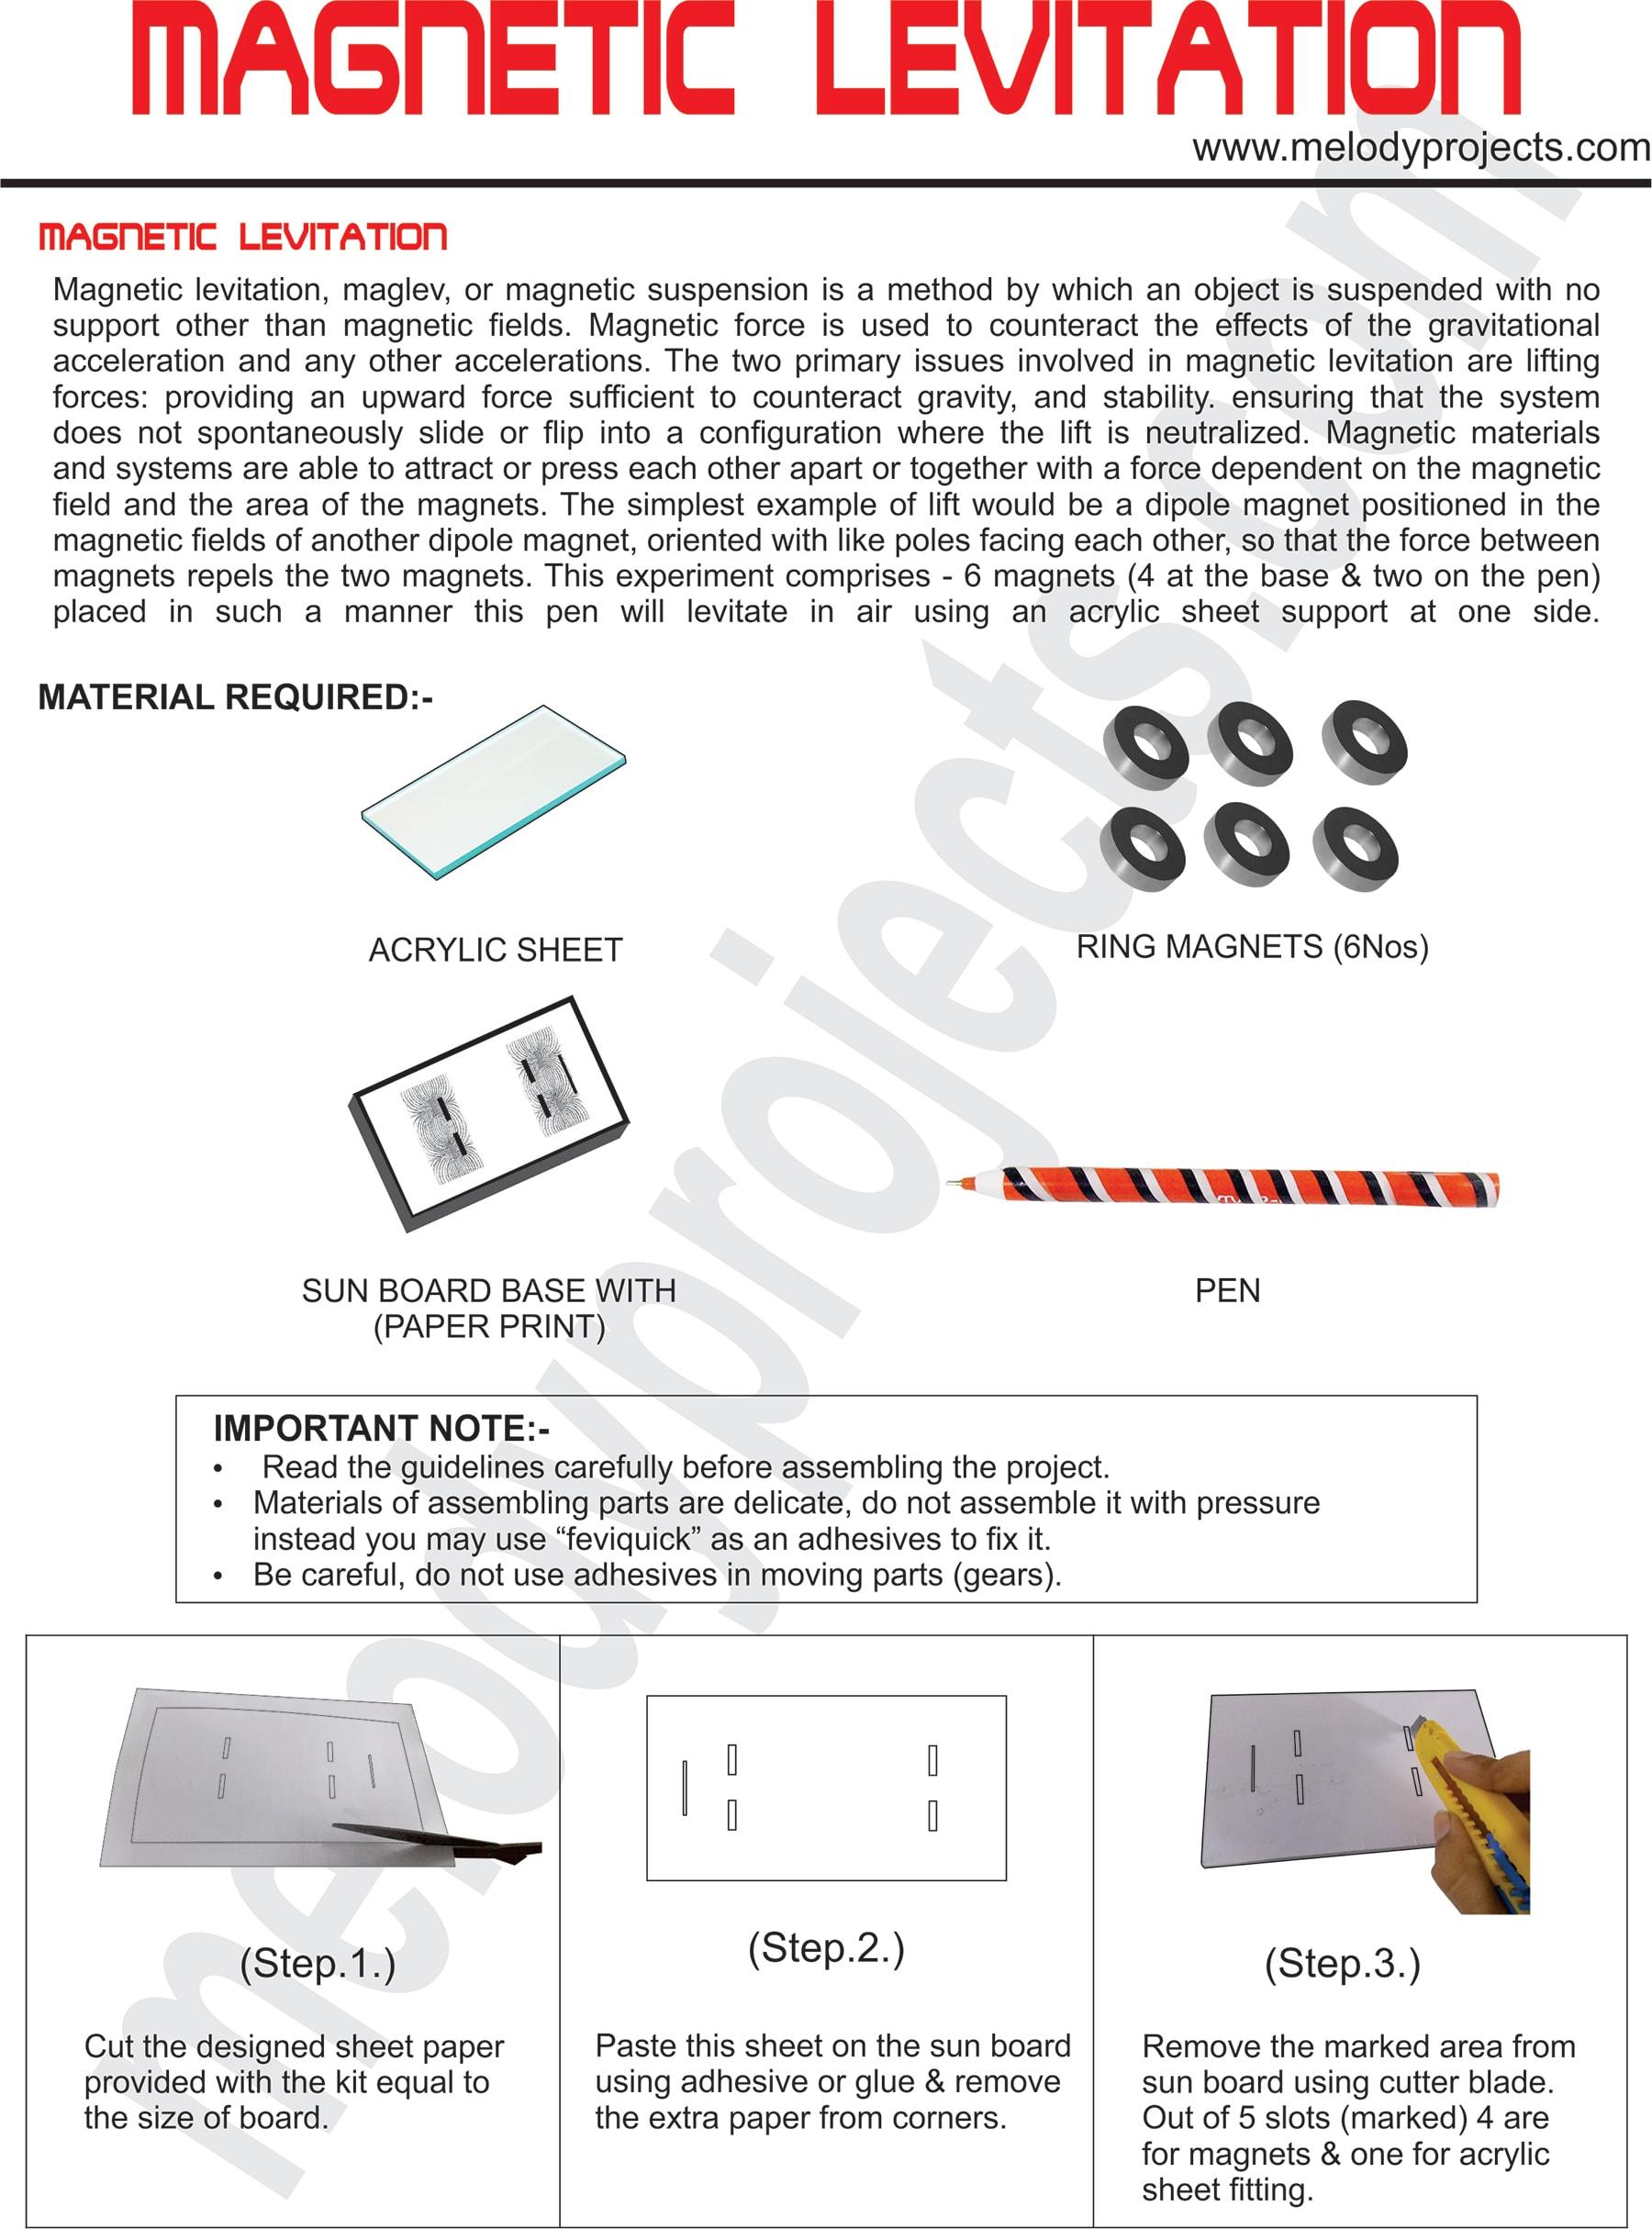 DIT-03- MAGNETIC LEVITATION